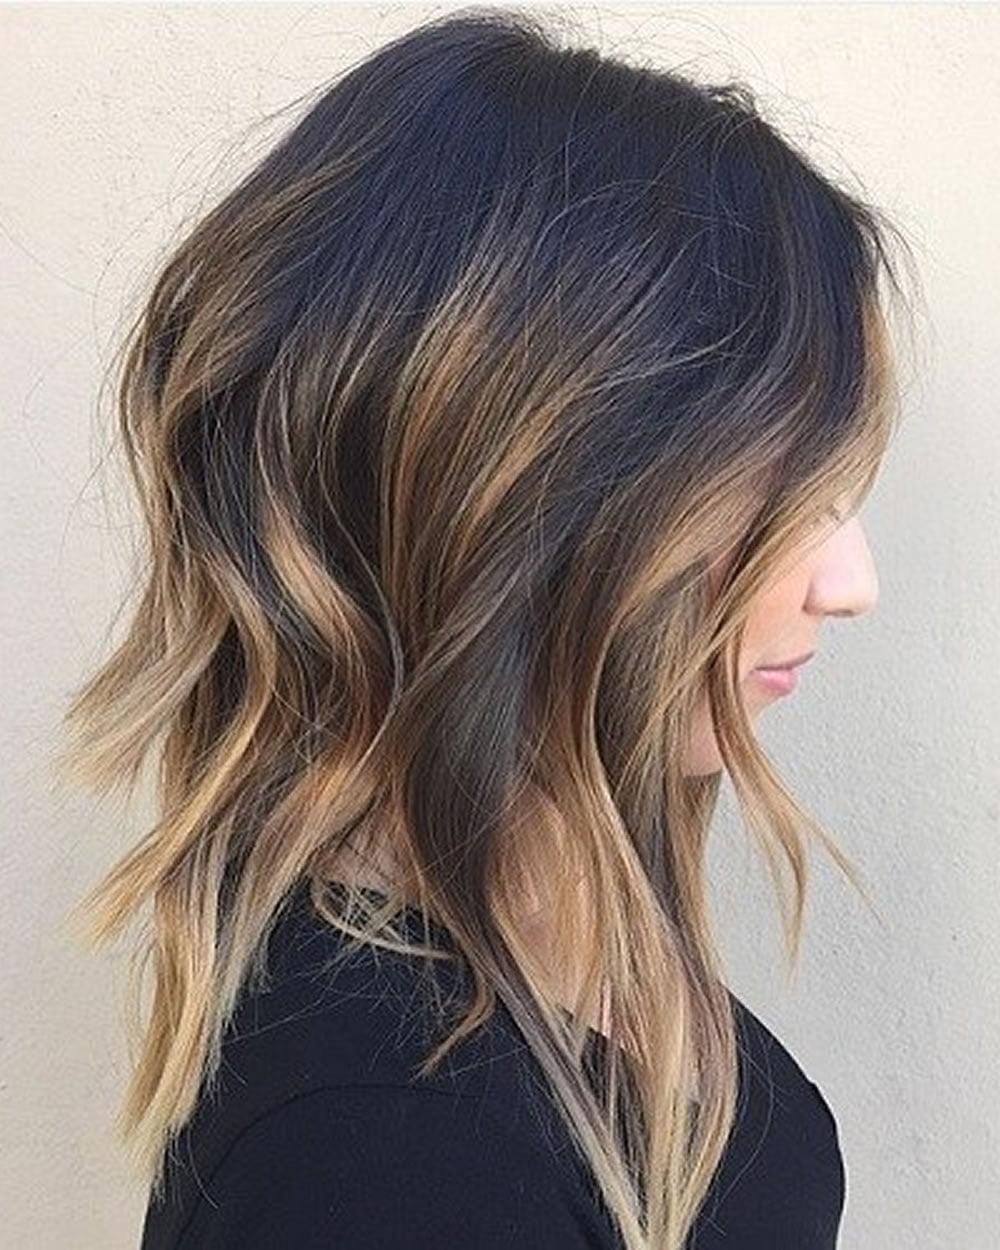 Asymmetrical Short Haircuts With Balayage Highlights 2018